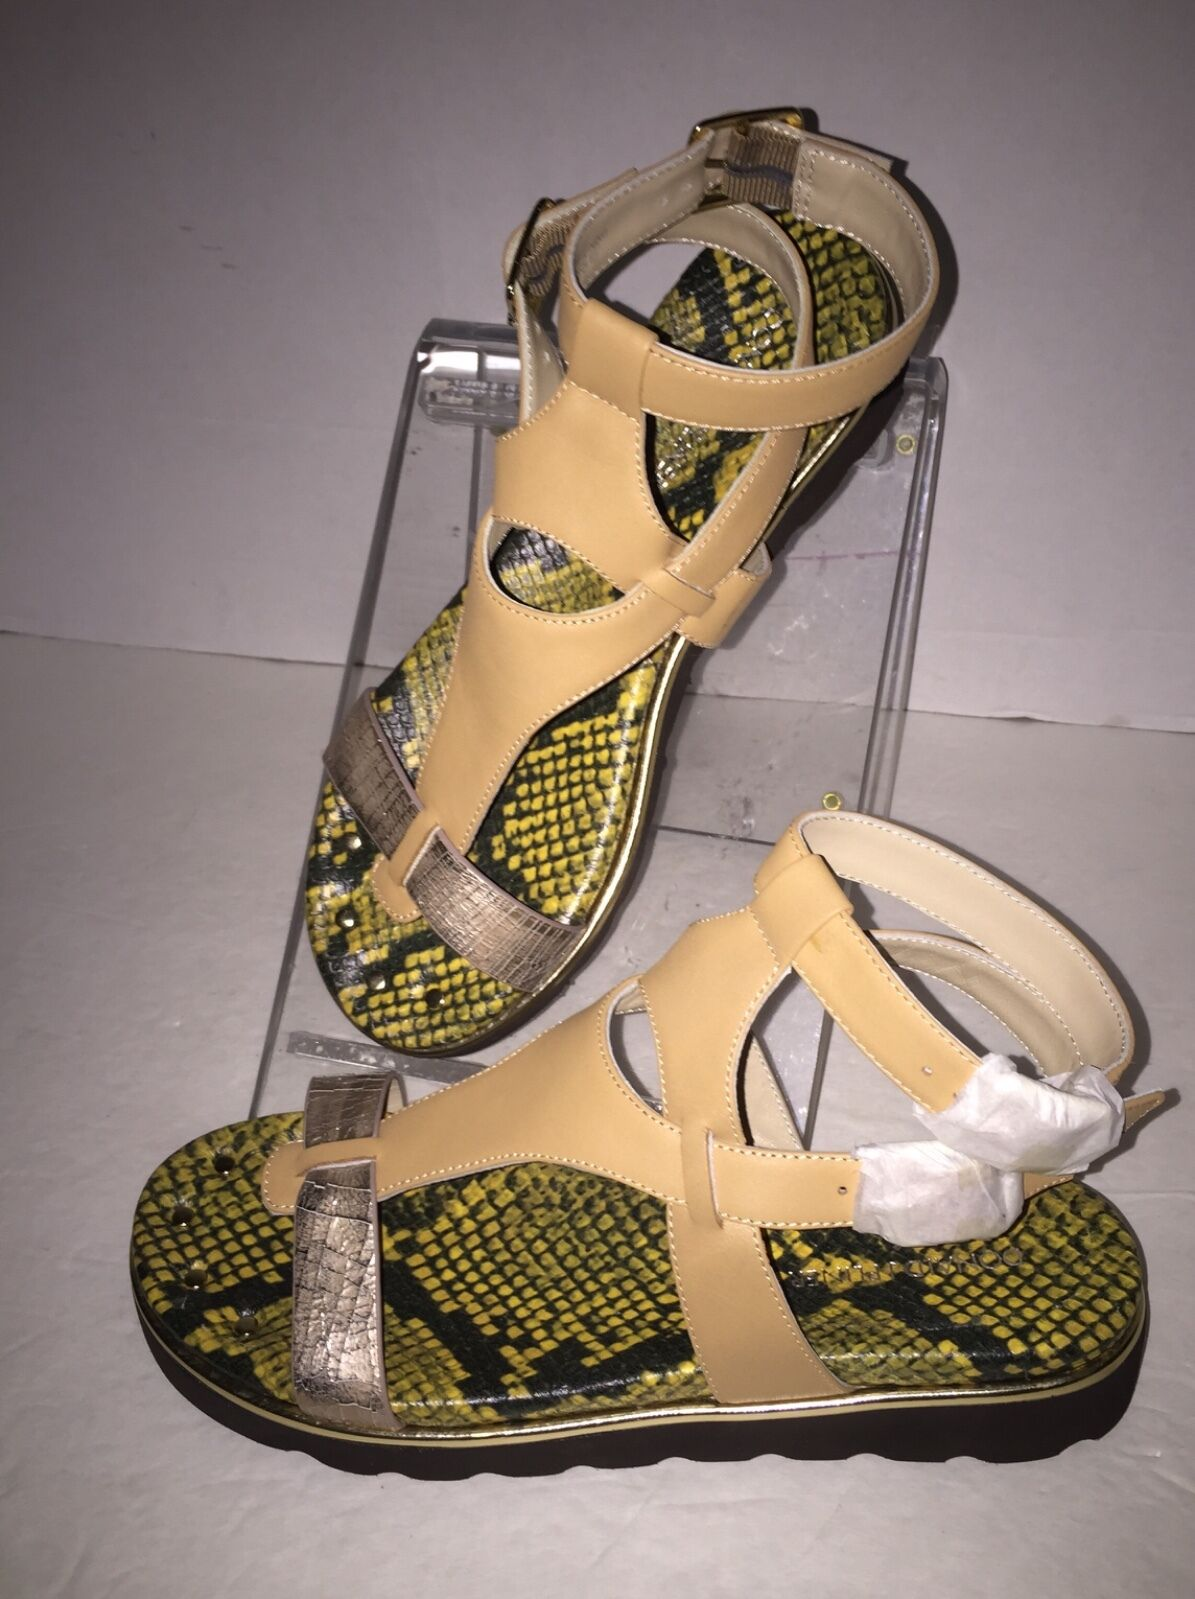 Donald Pliner Lido Platino Cracked Metallic Leder Gladiator Sandale 8.5